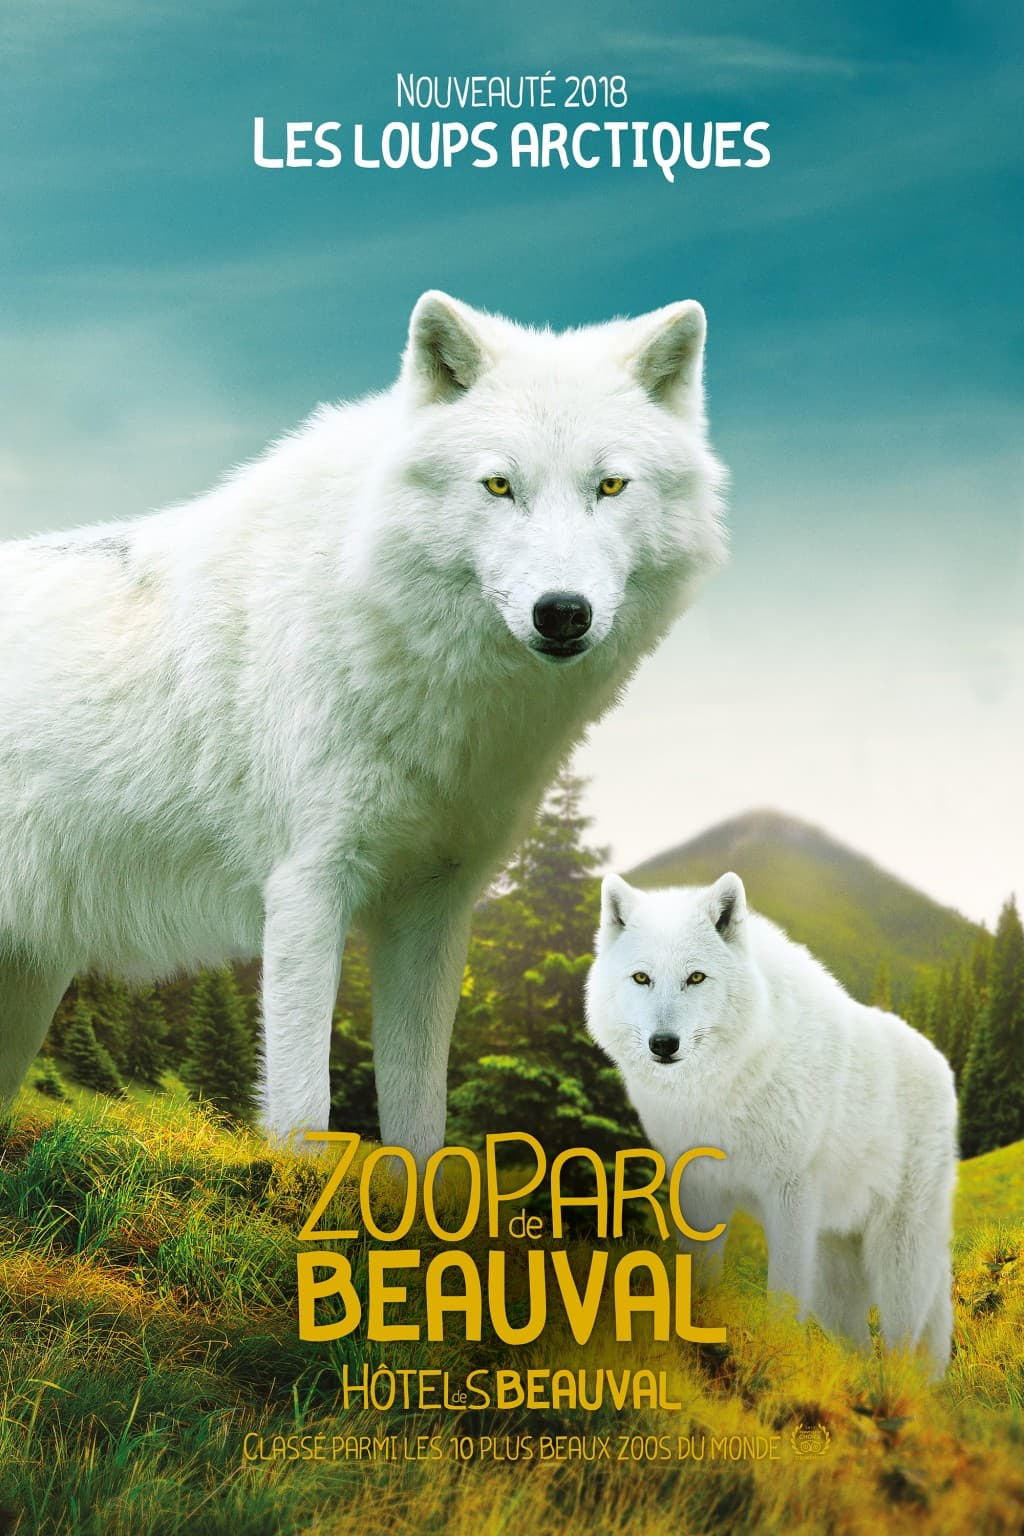 Loup articques, Zoo de Beauval